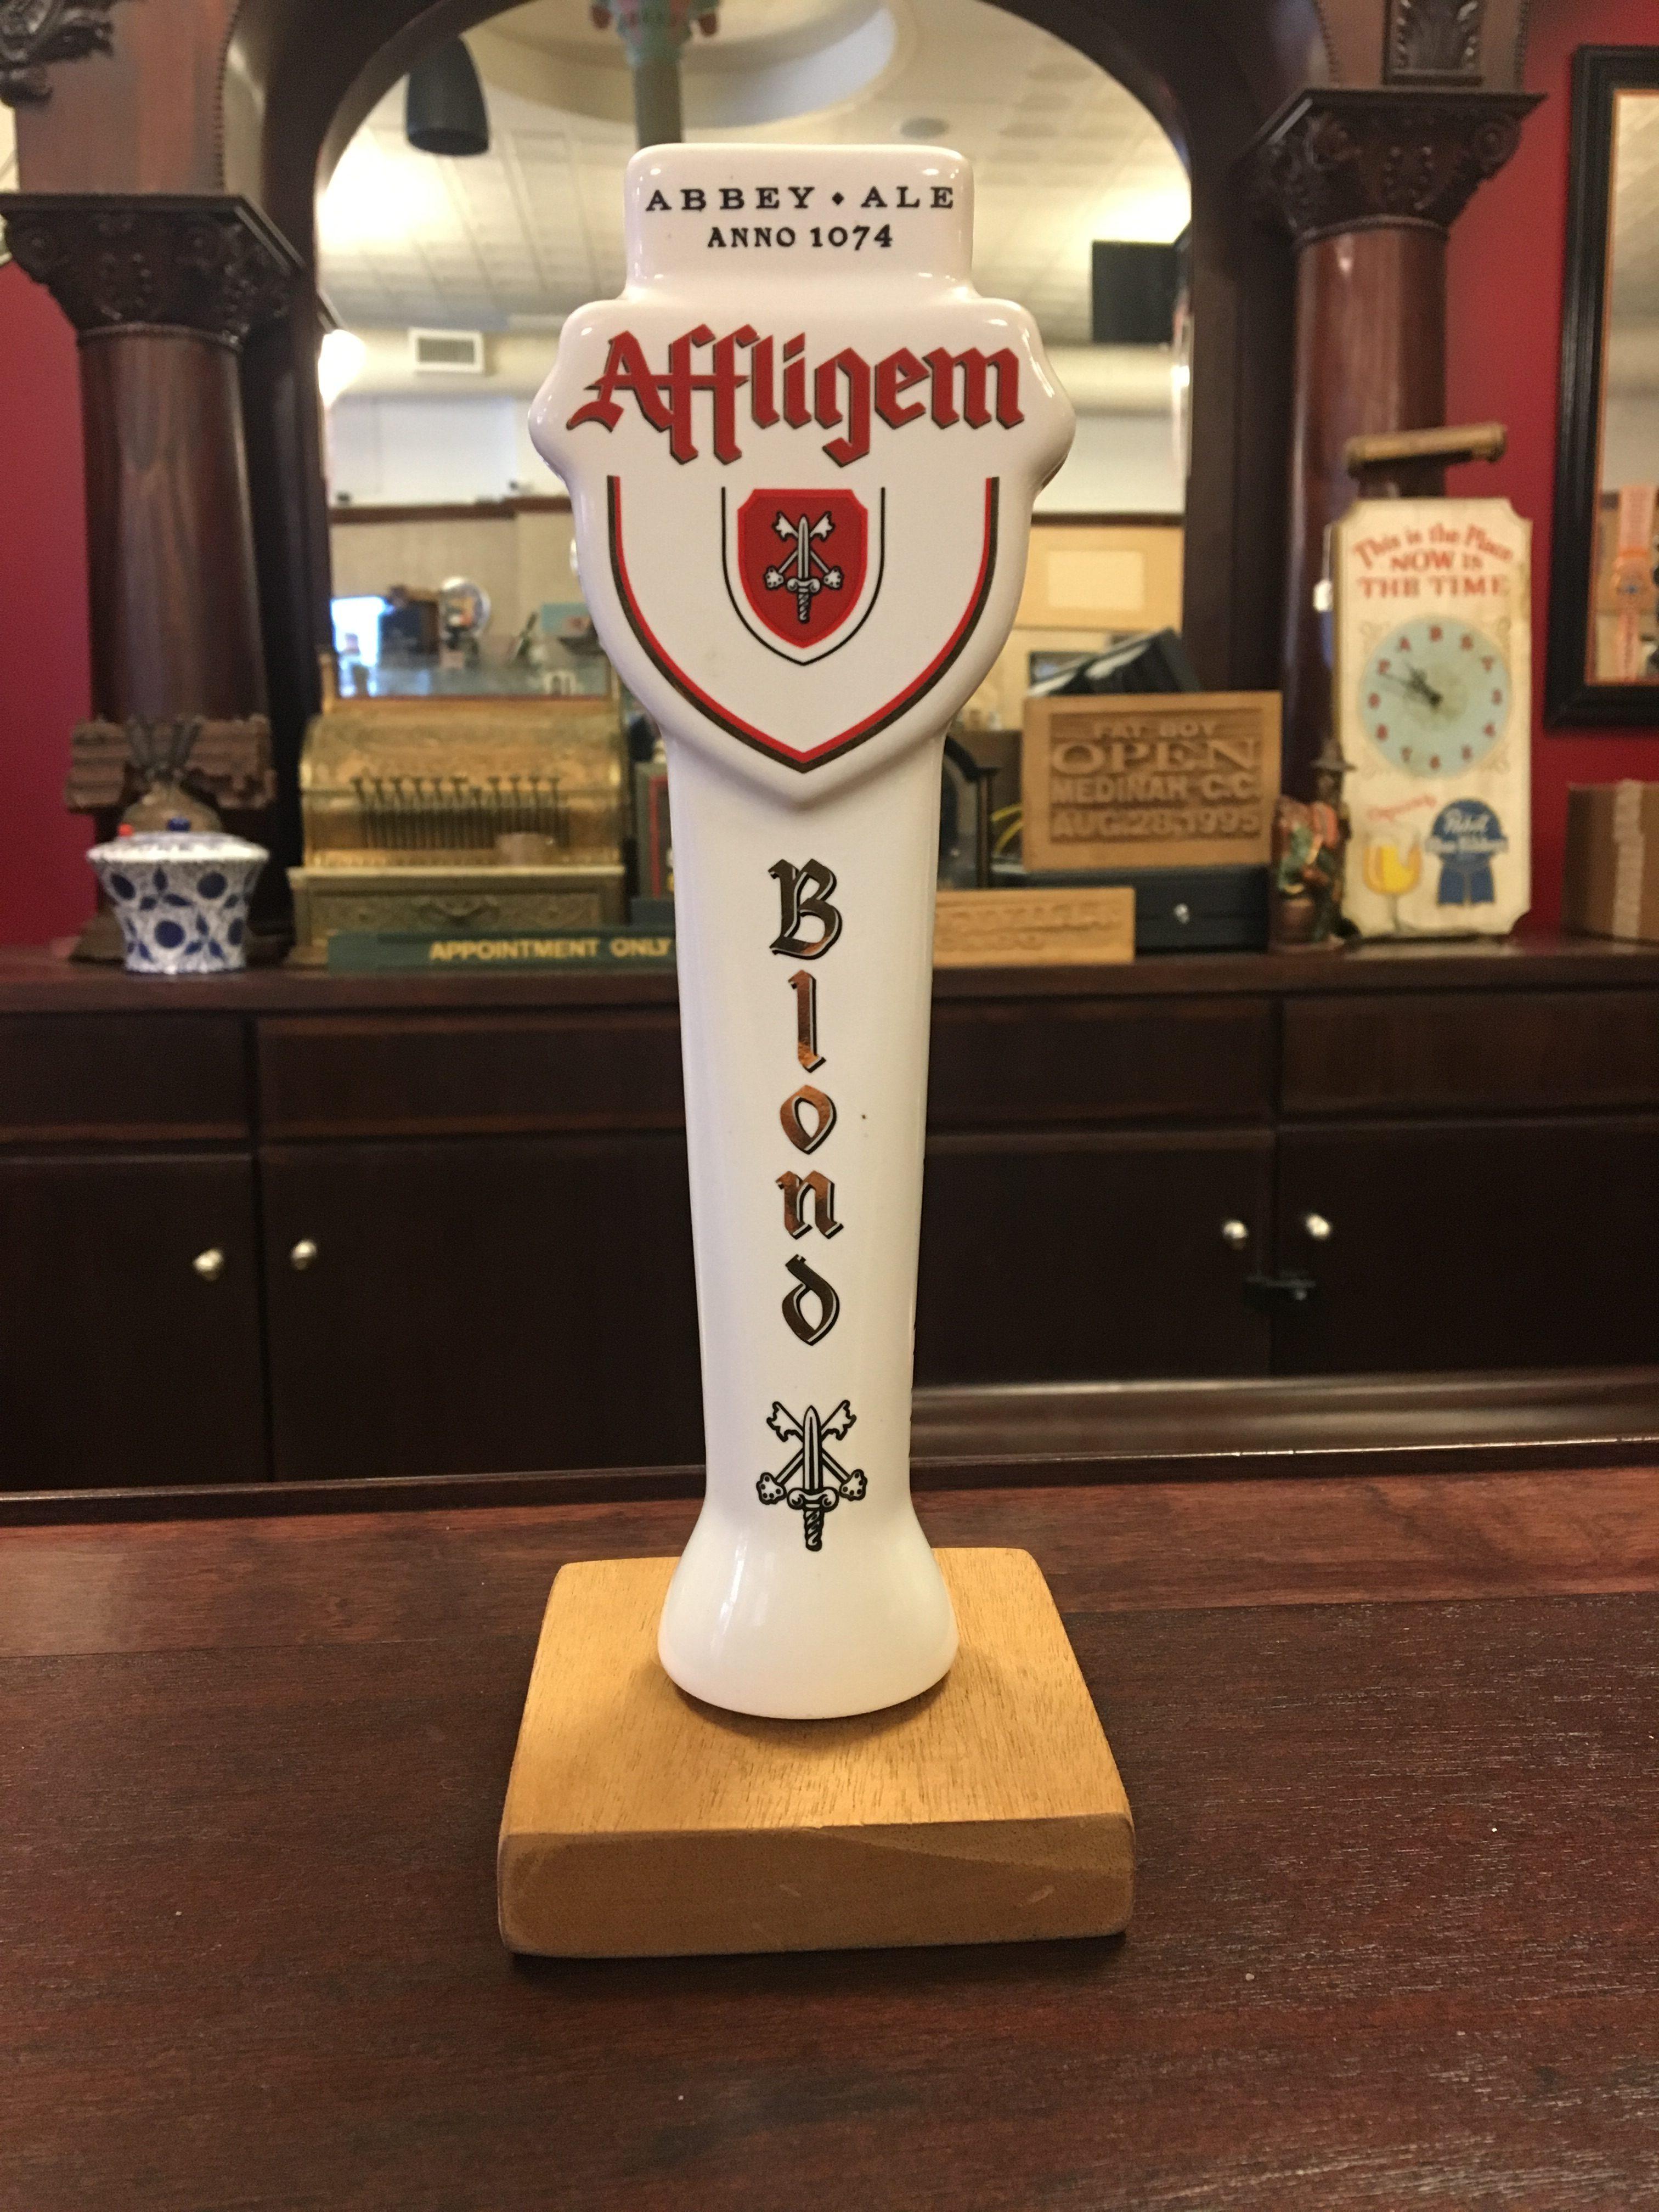 Photo Of Affligen Blond Abbey Ale Tap Handle